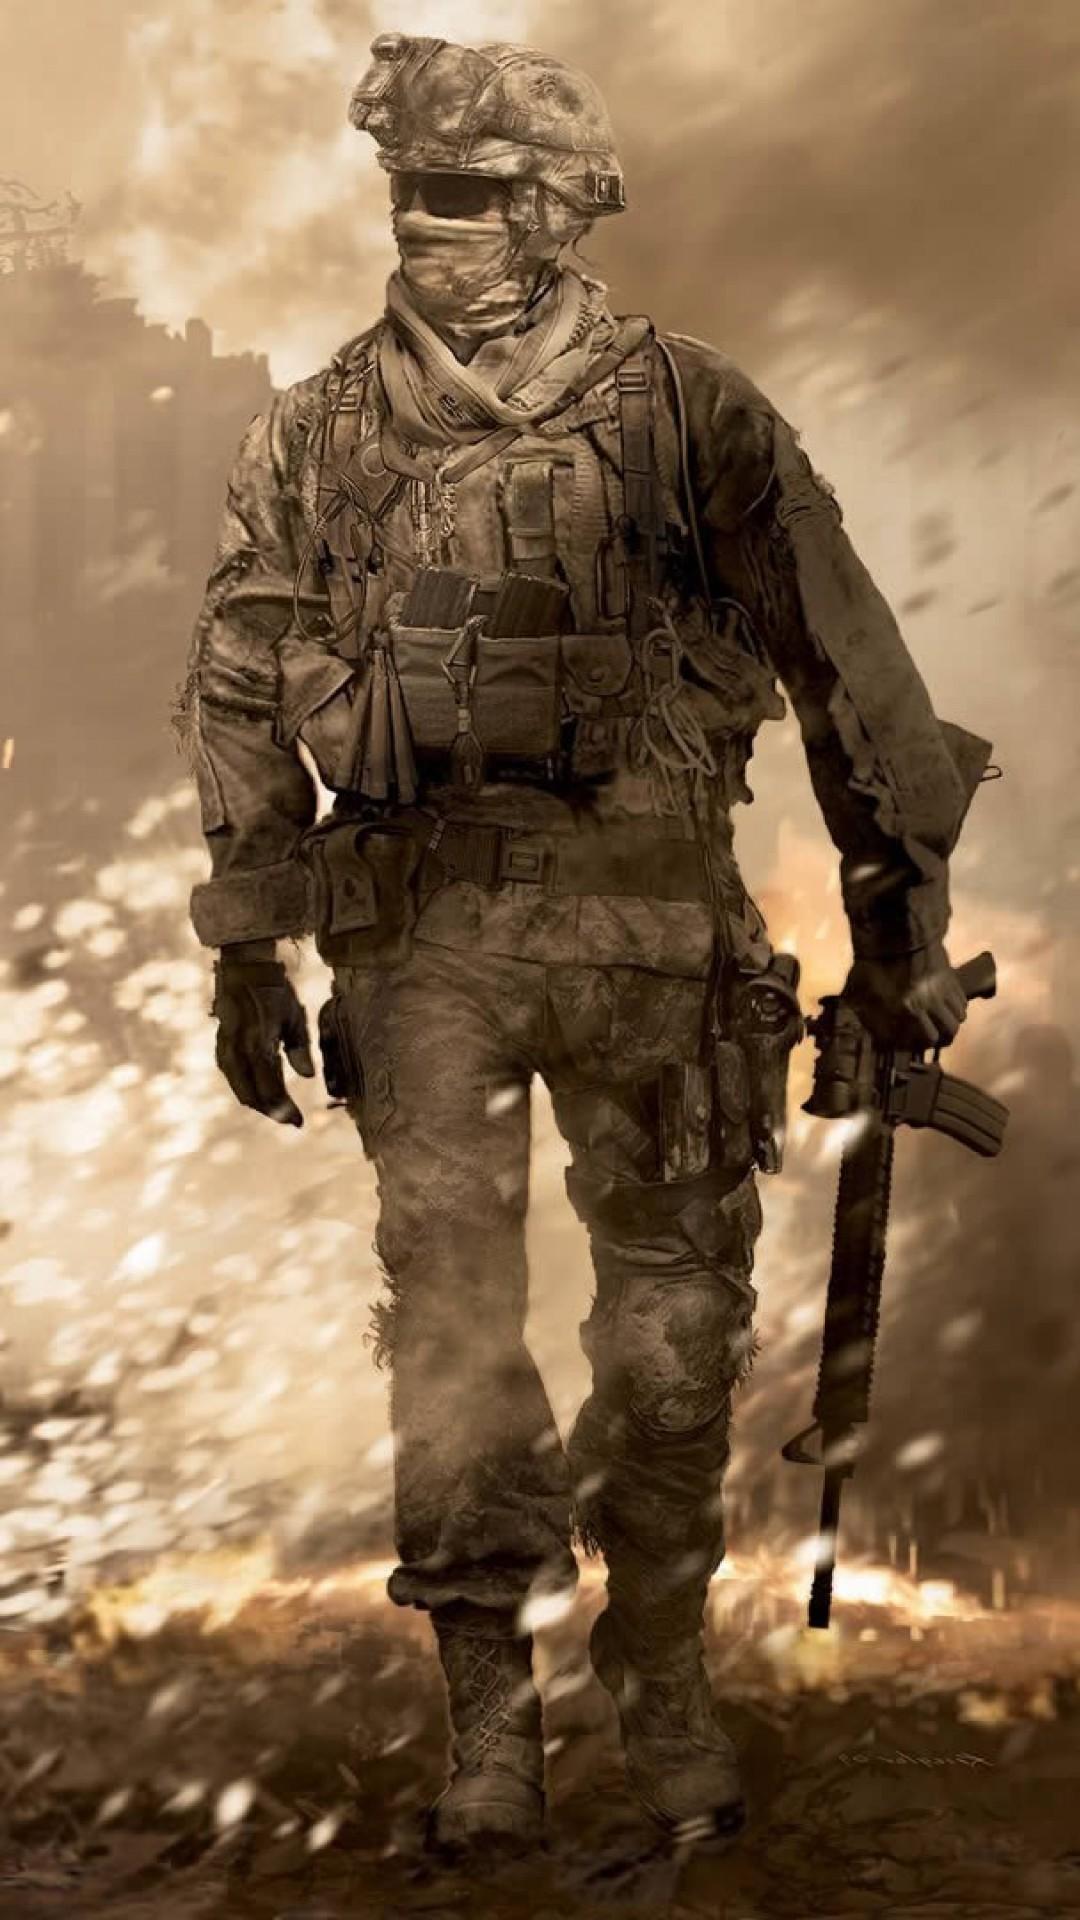 Modern Warfare Iphone Wallpapers Wallpaper Cave